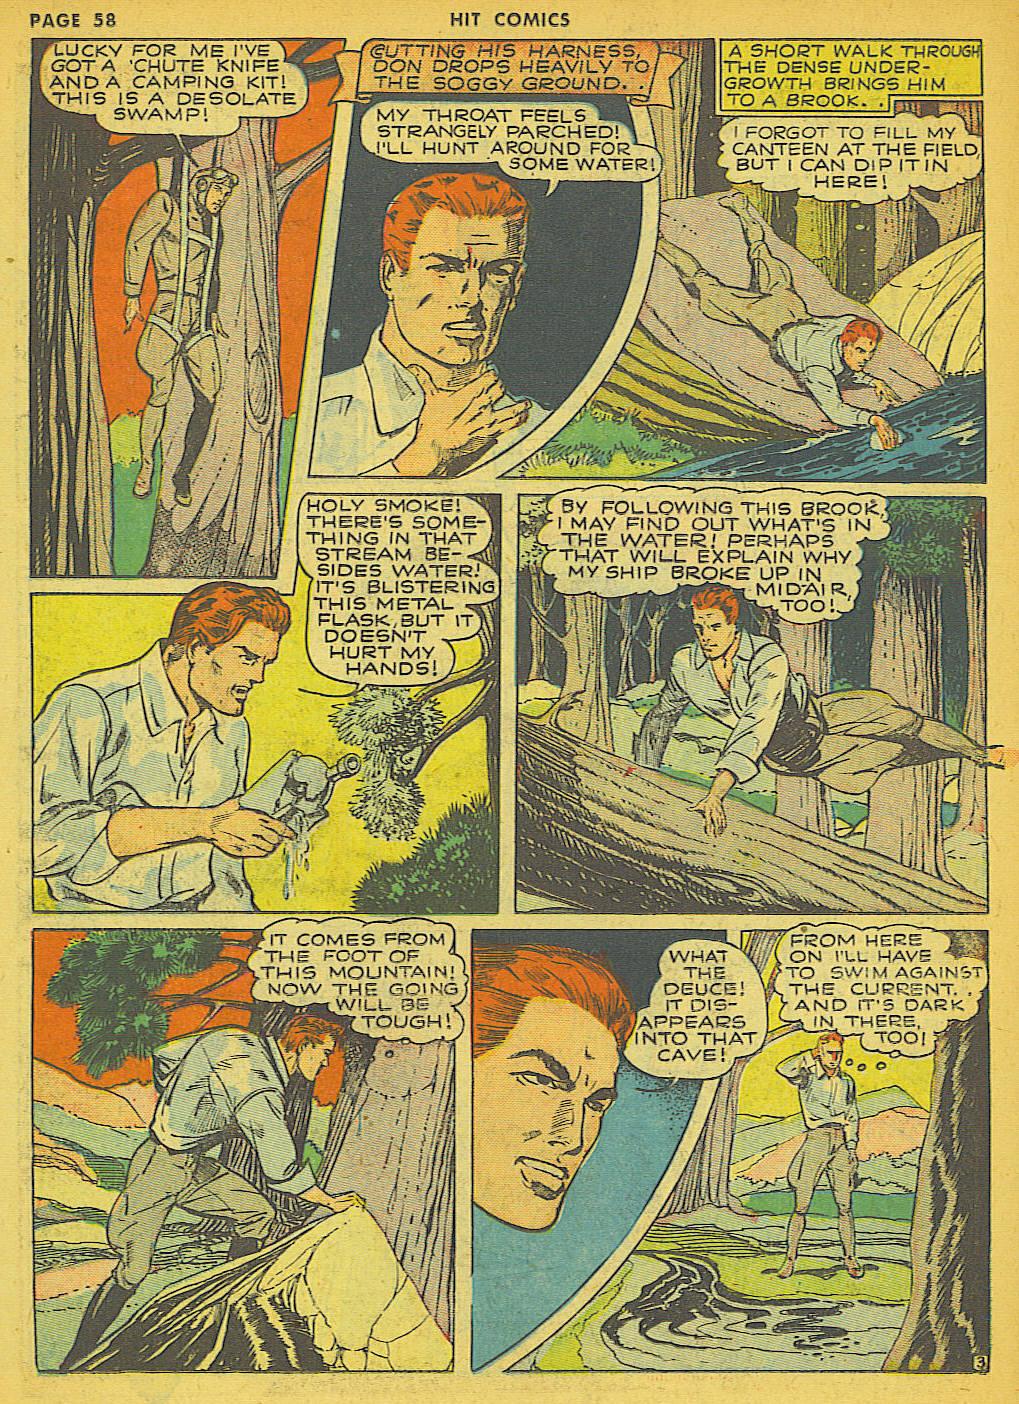 Read online Hit Comics comic -  Issue #21 - 60